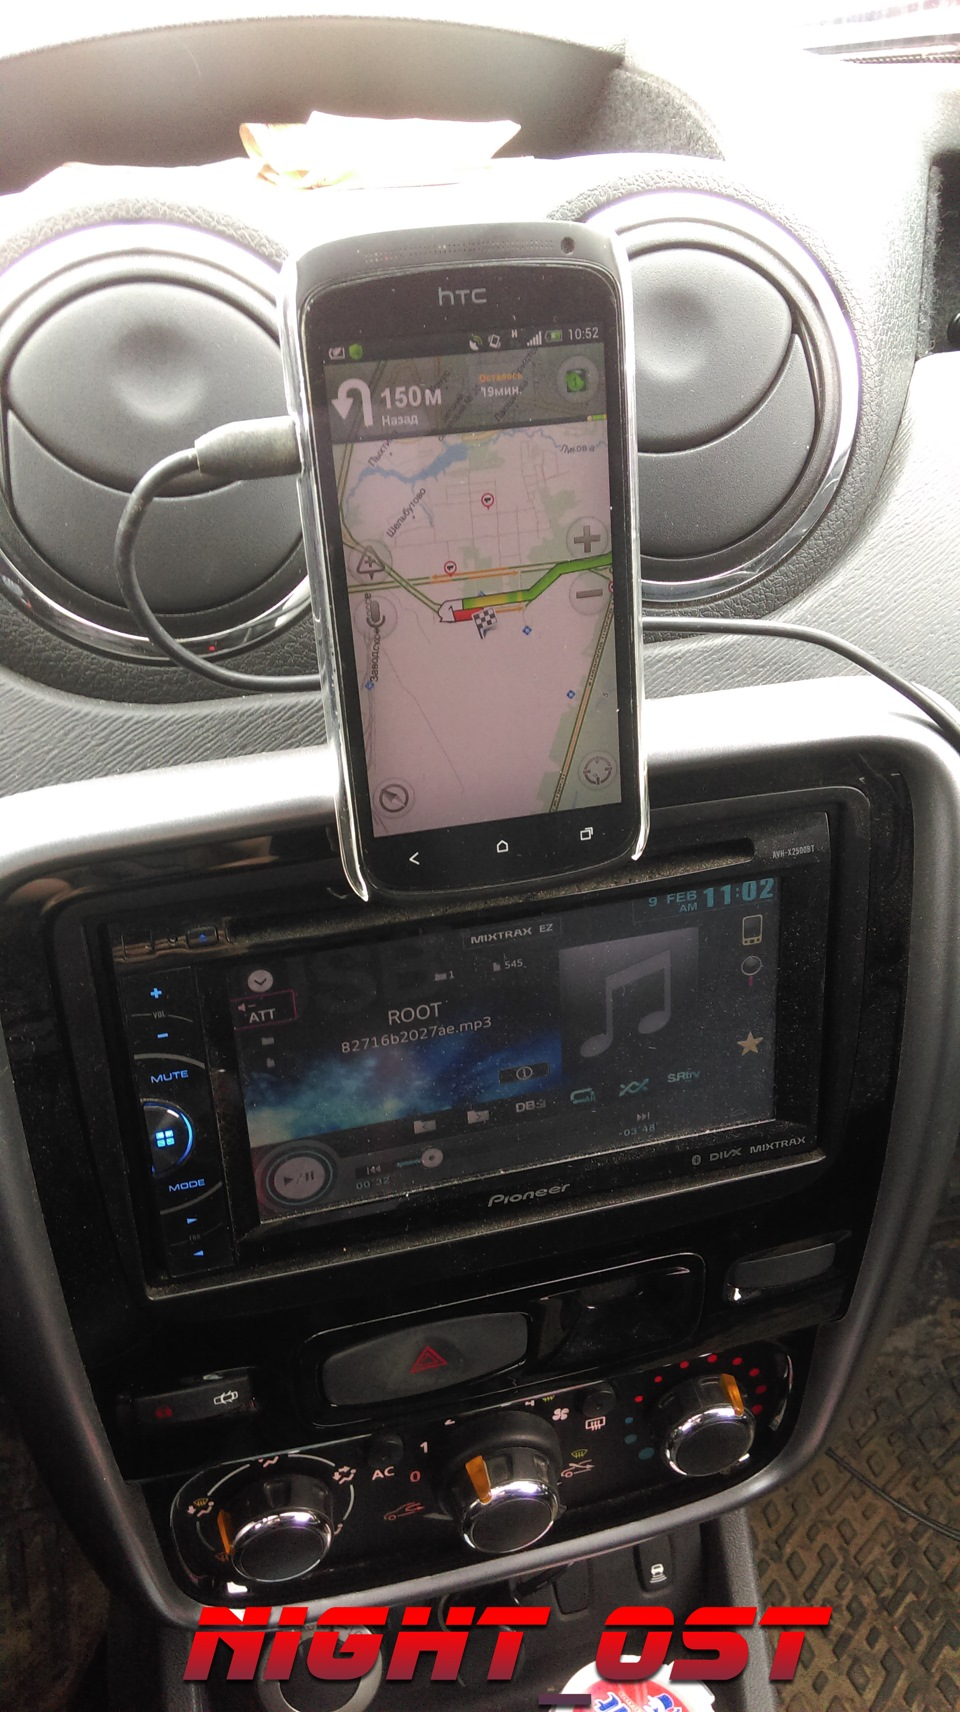 Подставка под телефон в машину своими руками фото 468